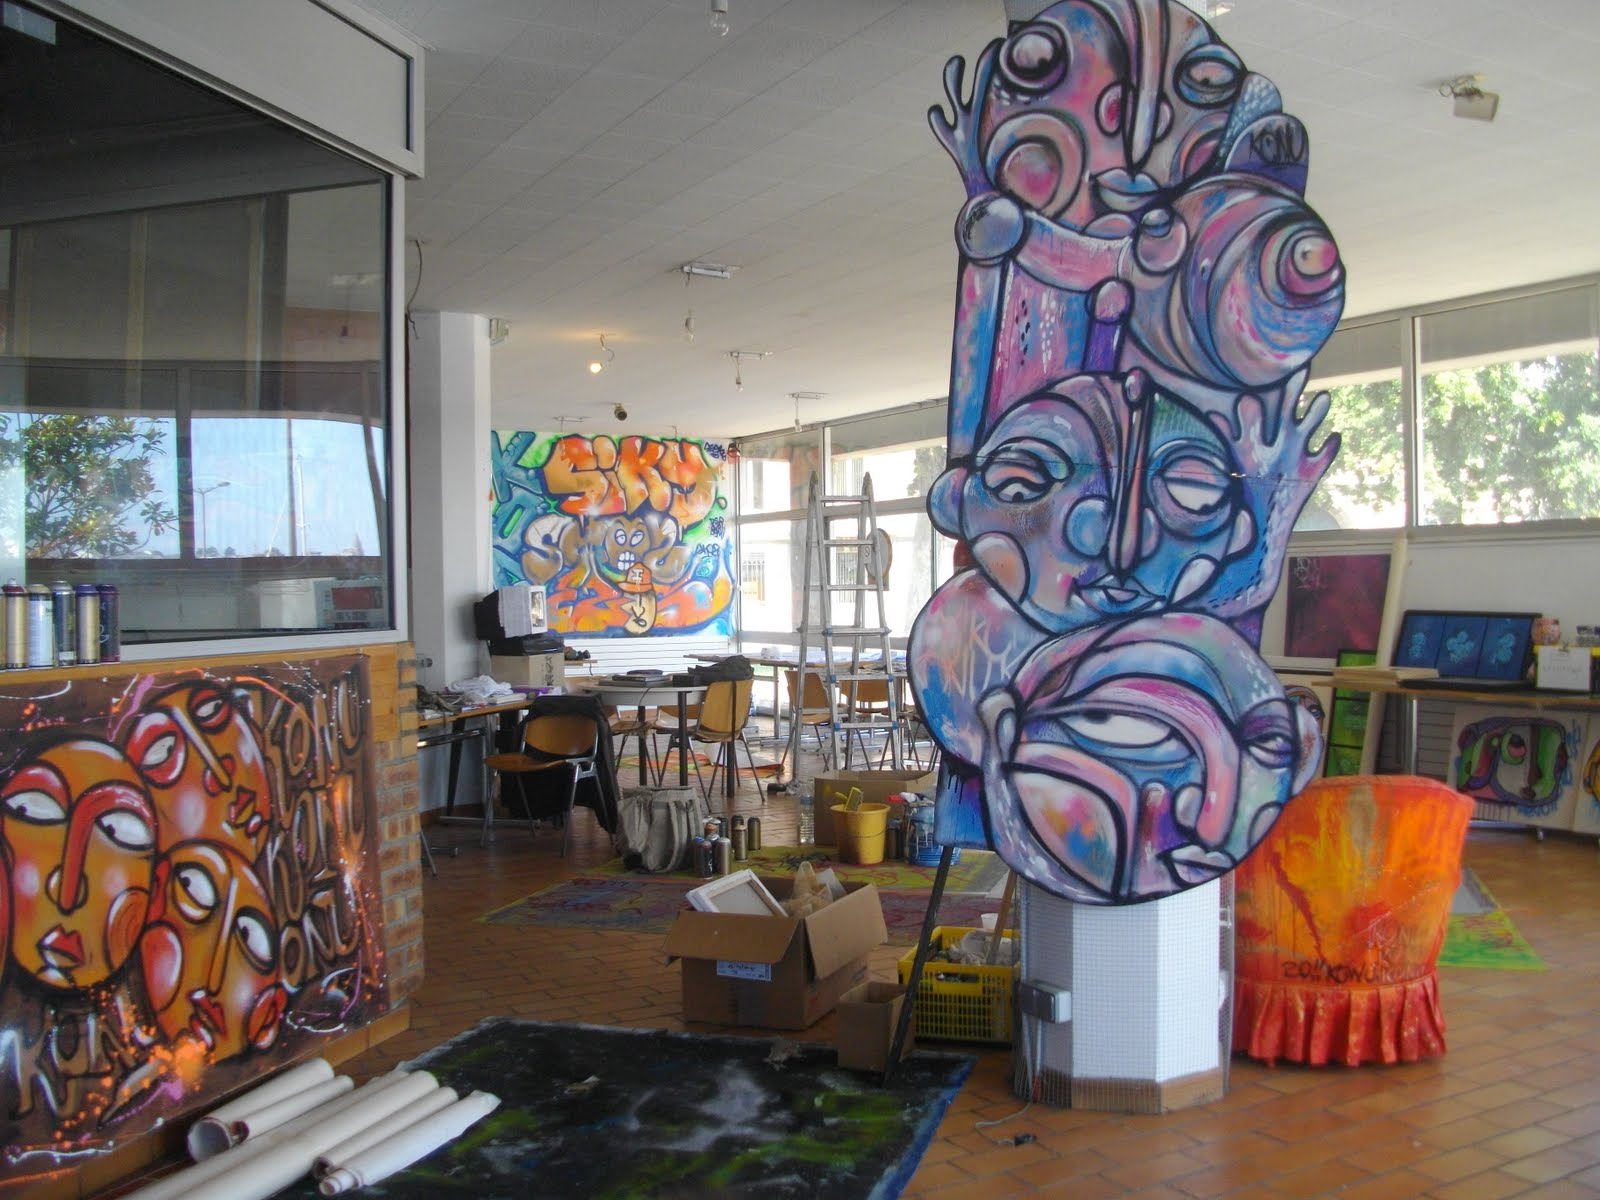 graffiti normand juillet 2011 pinard sauciflard ricard. Black Bedroom Furniture Sets. Home Design Ideas